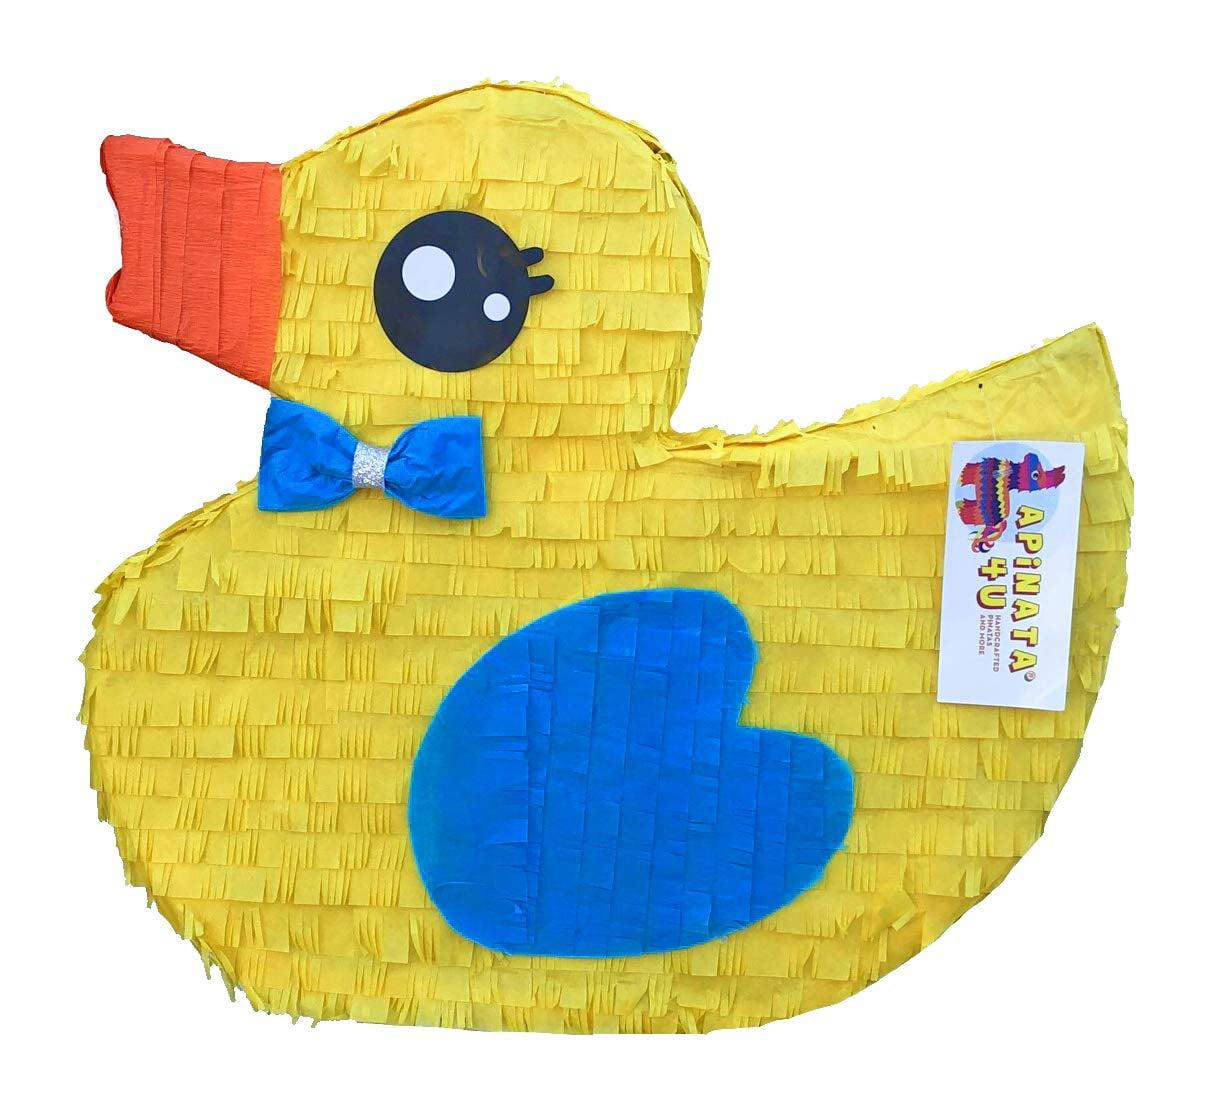 APINATA4U It's a Boy Rubber Duck Pinata for Baby Shower